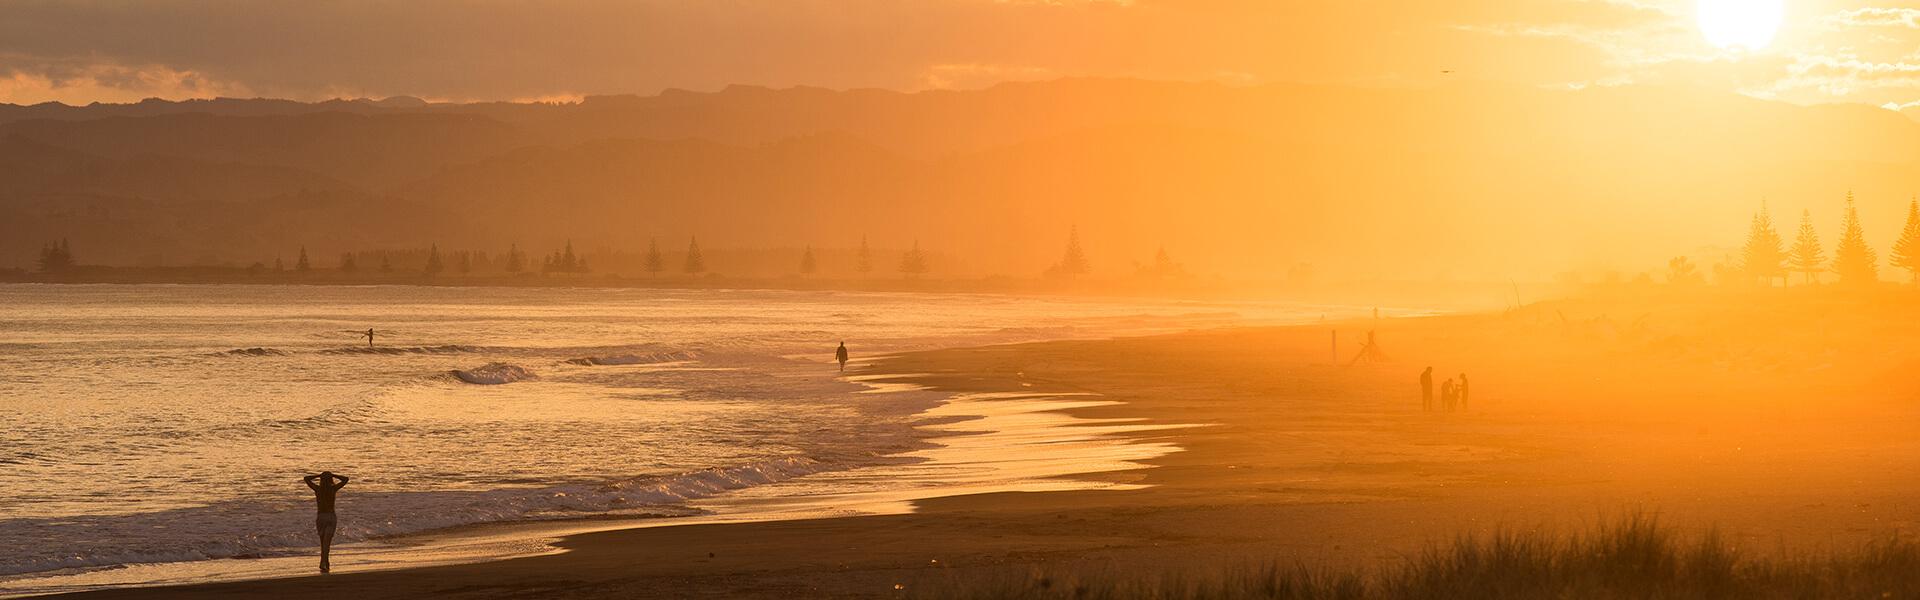 Matawhero-Wines-first-to-greet-the-sun-beach